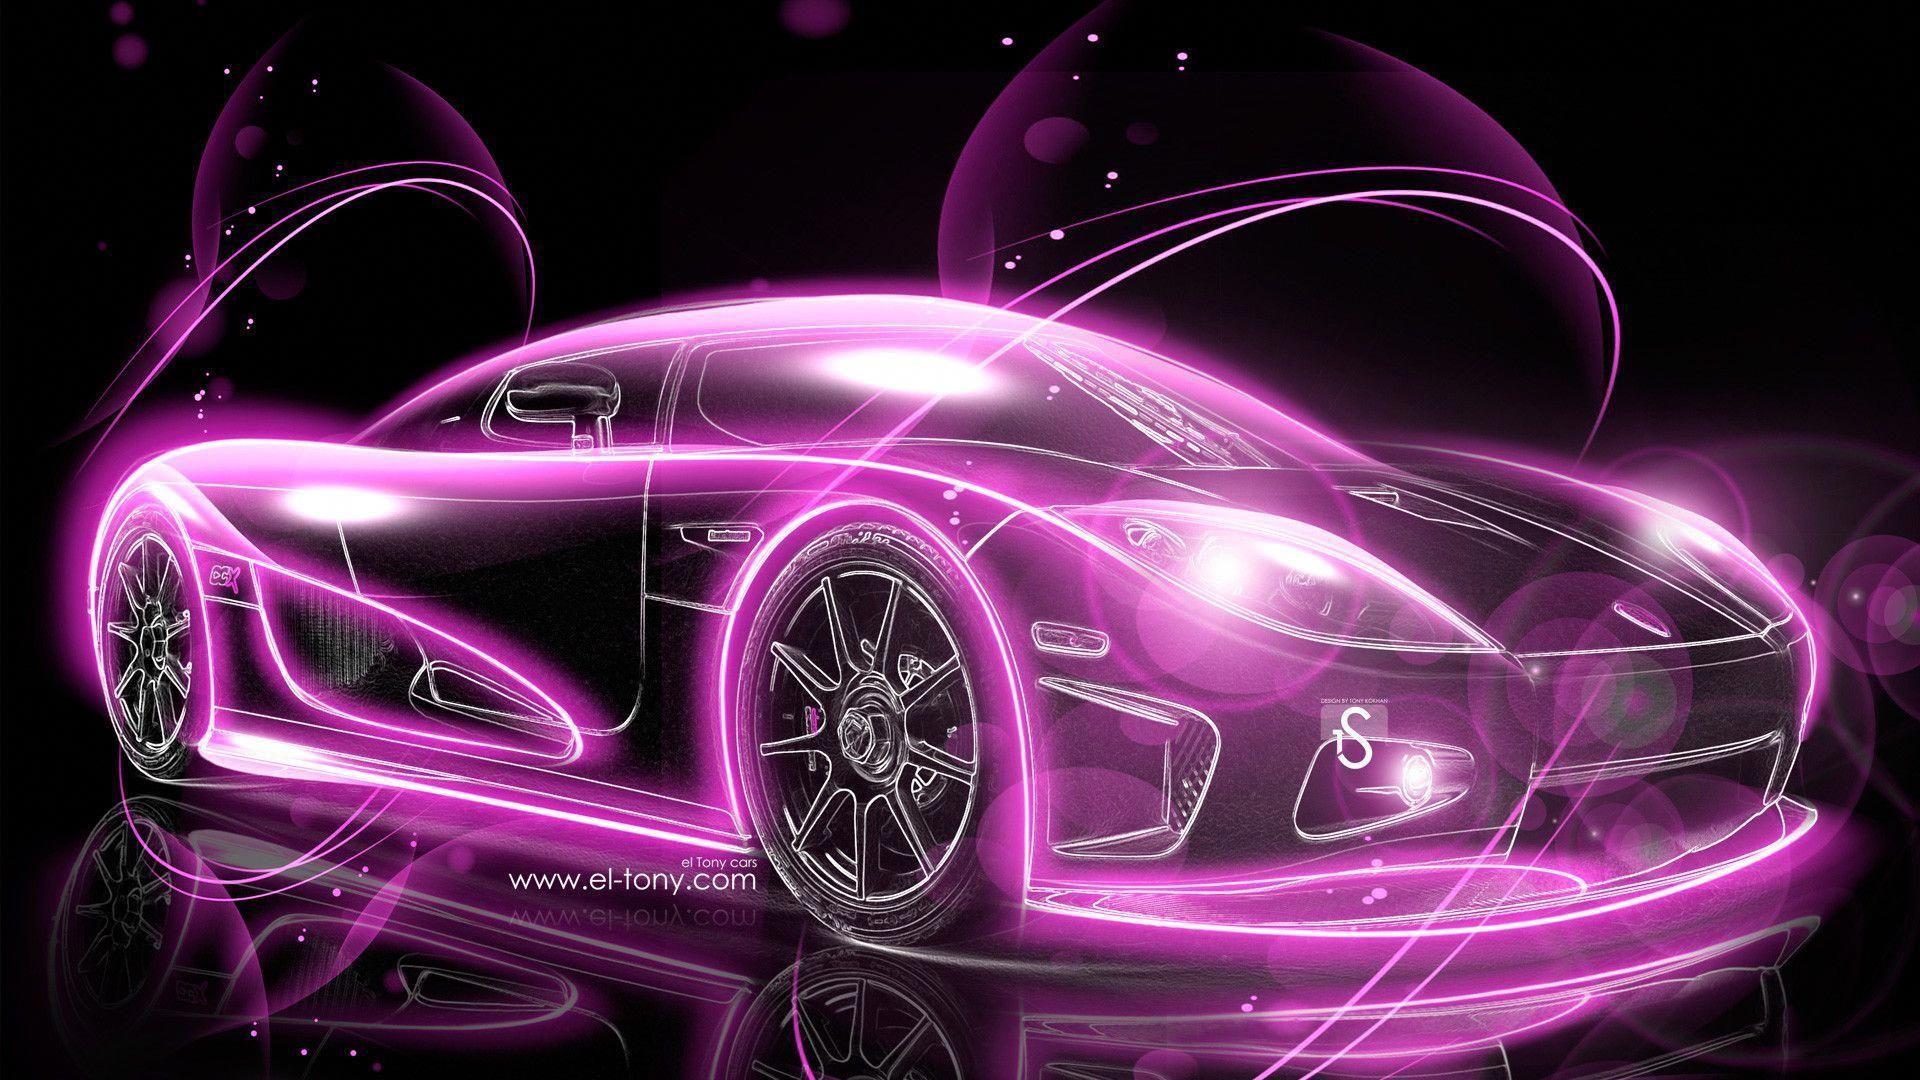 Audi Logo Wallpapers Hd Wallpaper Sport Cars | Audi Logo Wallpapers Hd Wallpaper